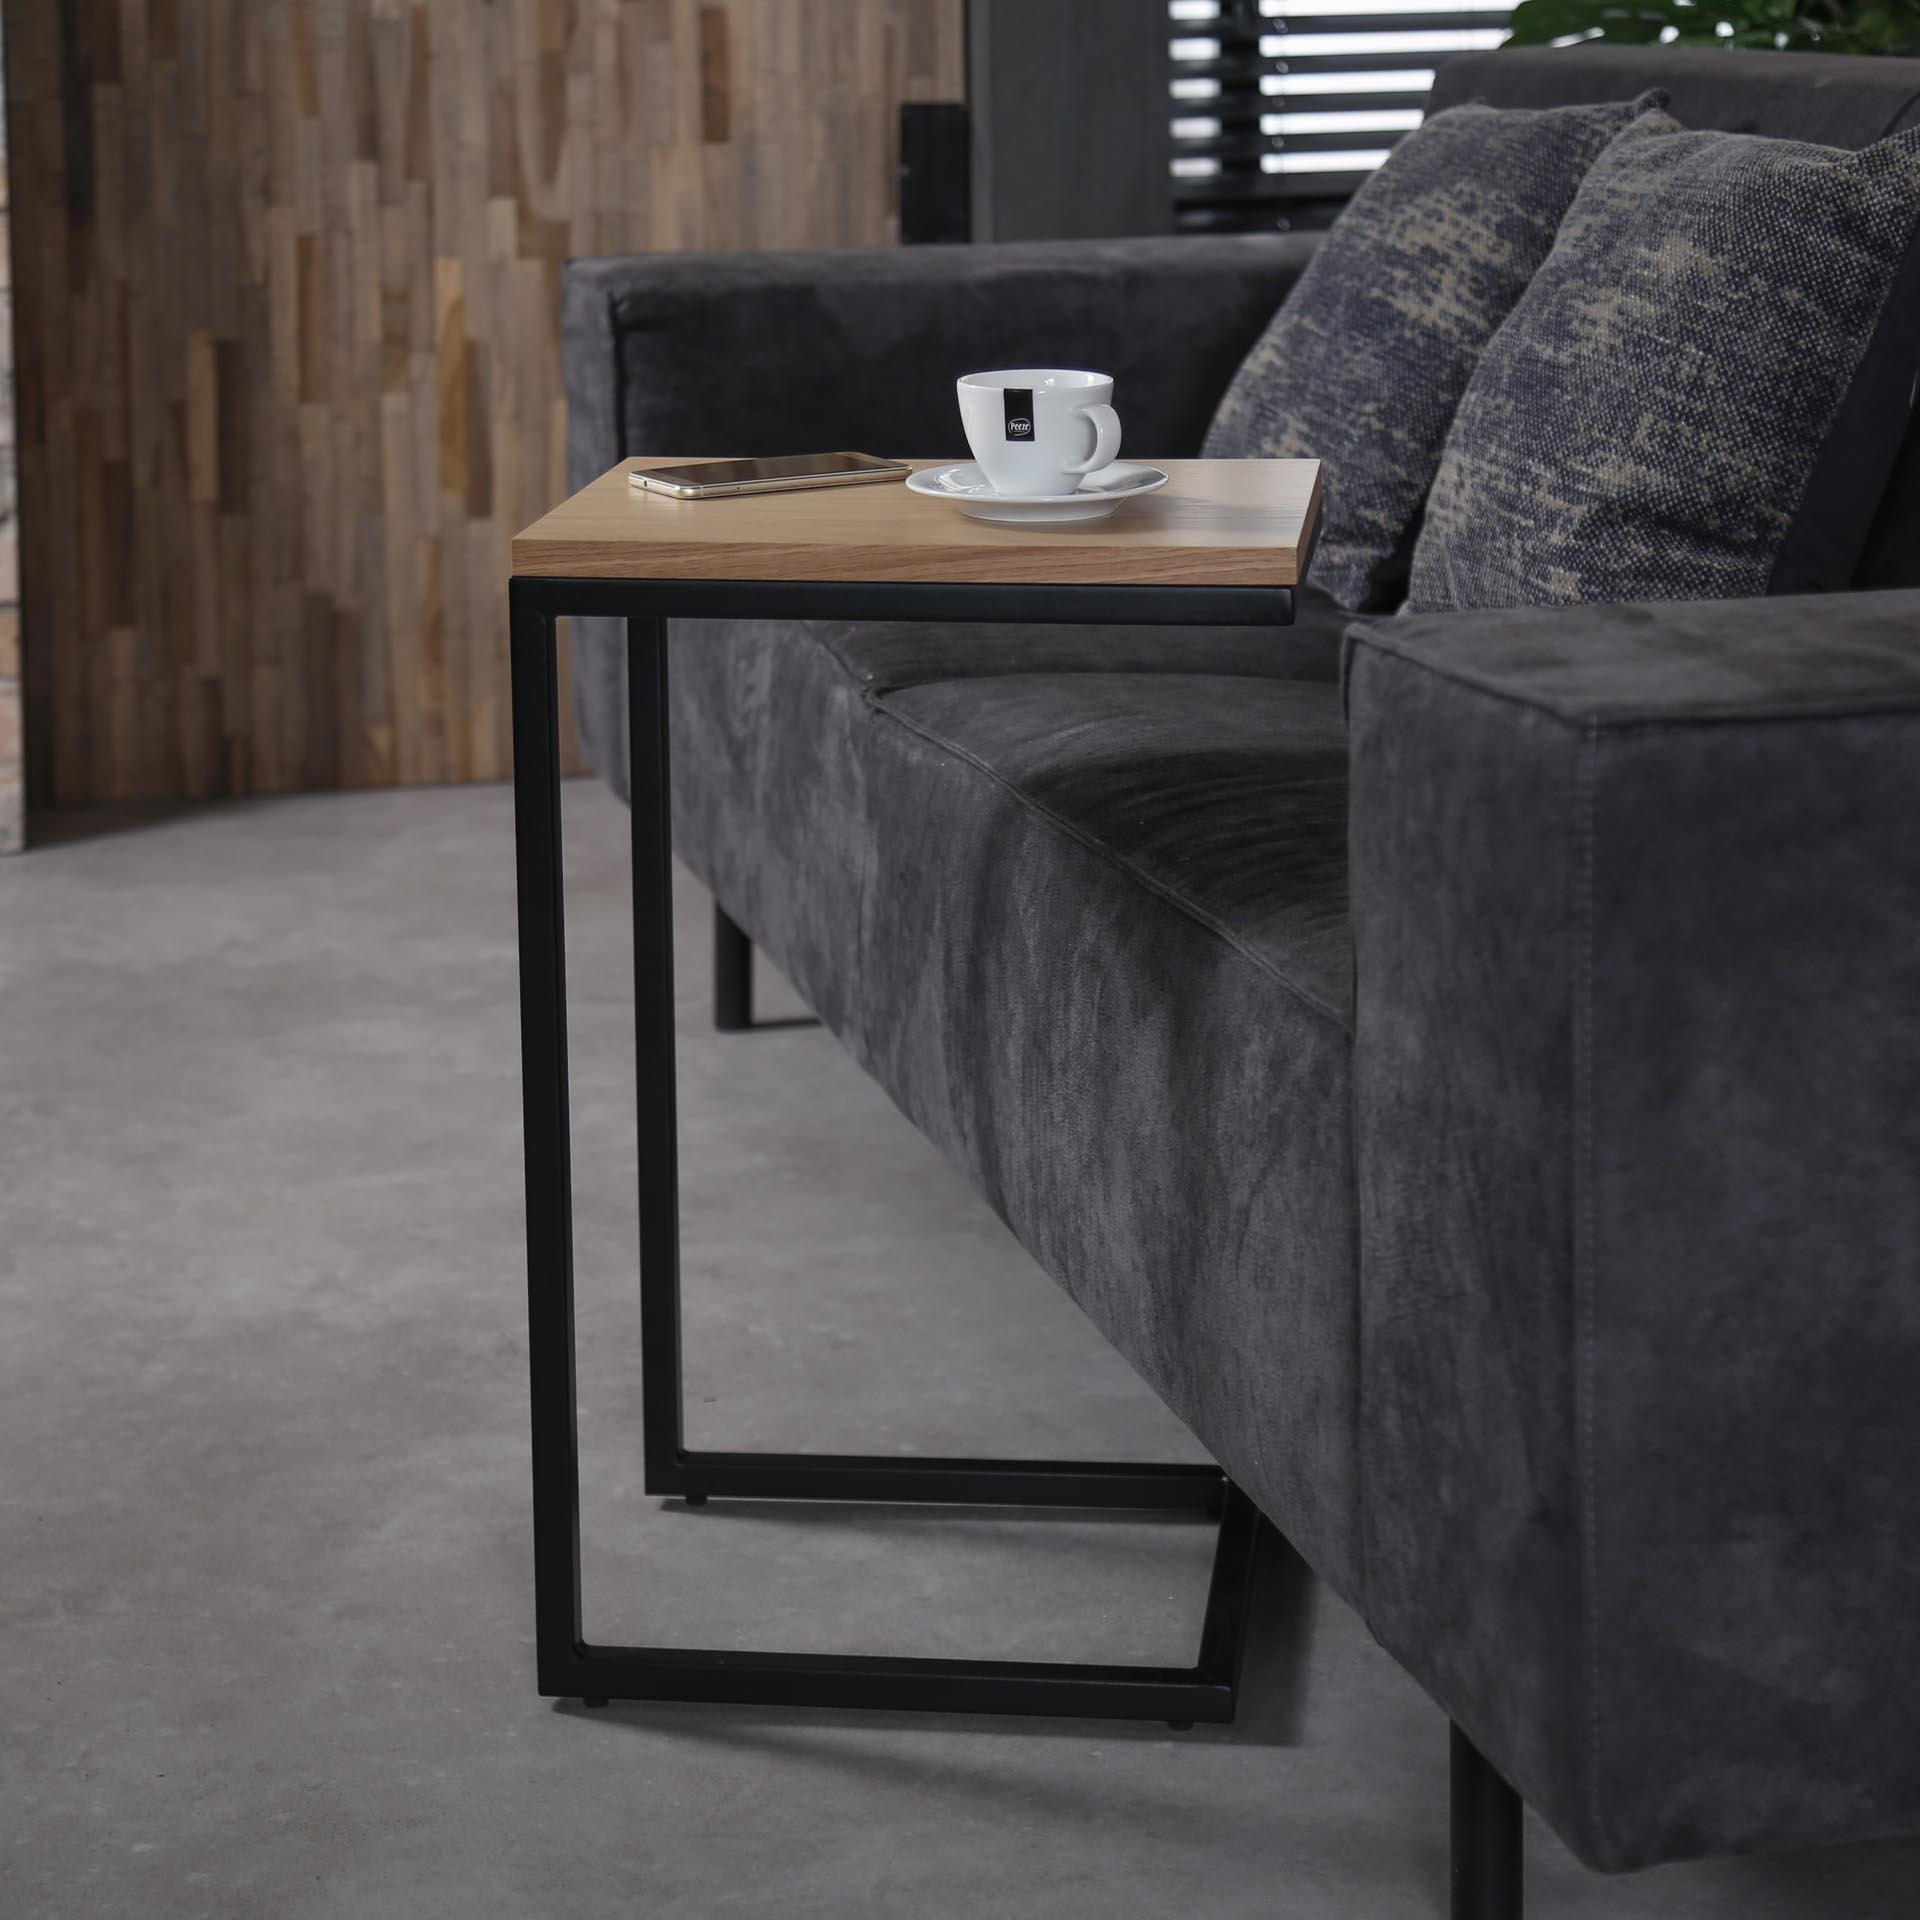 Petite table d\'appoint rectangulaire Göteborg